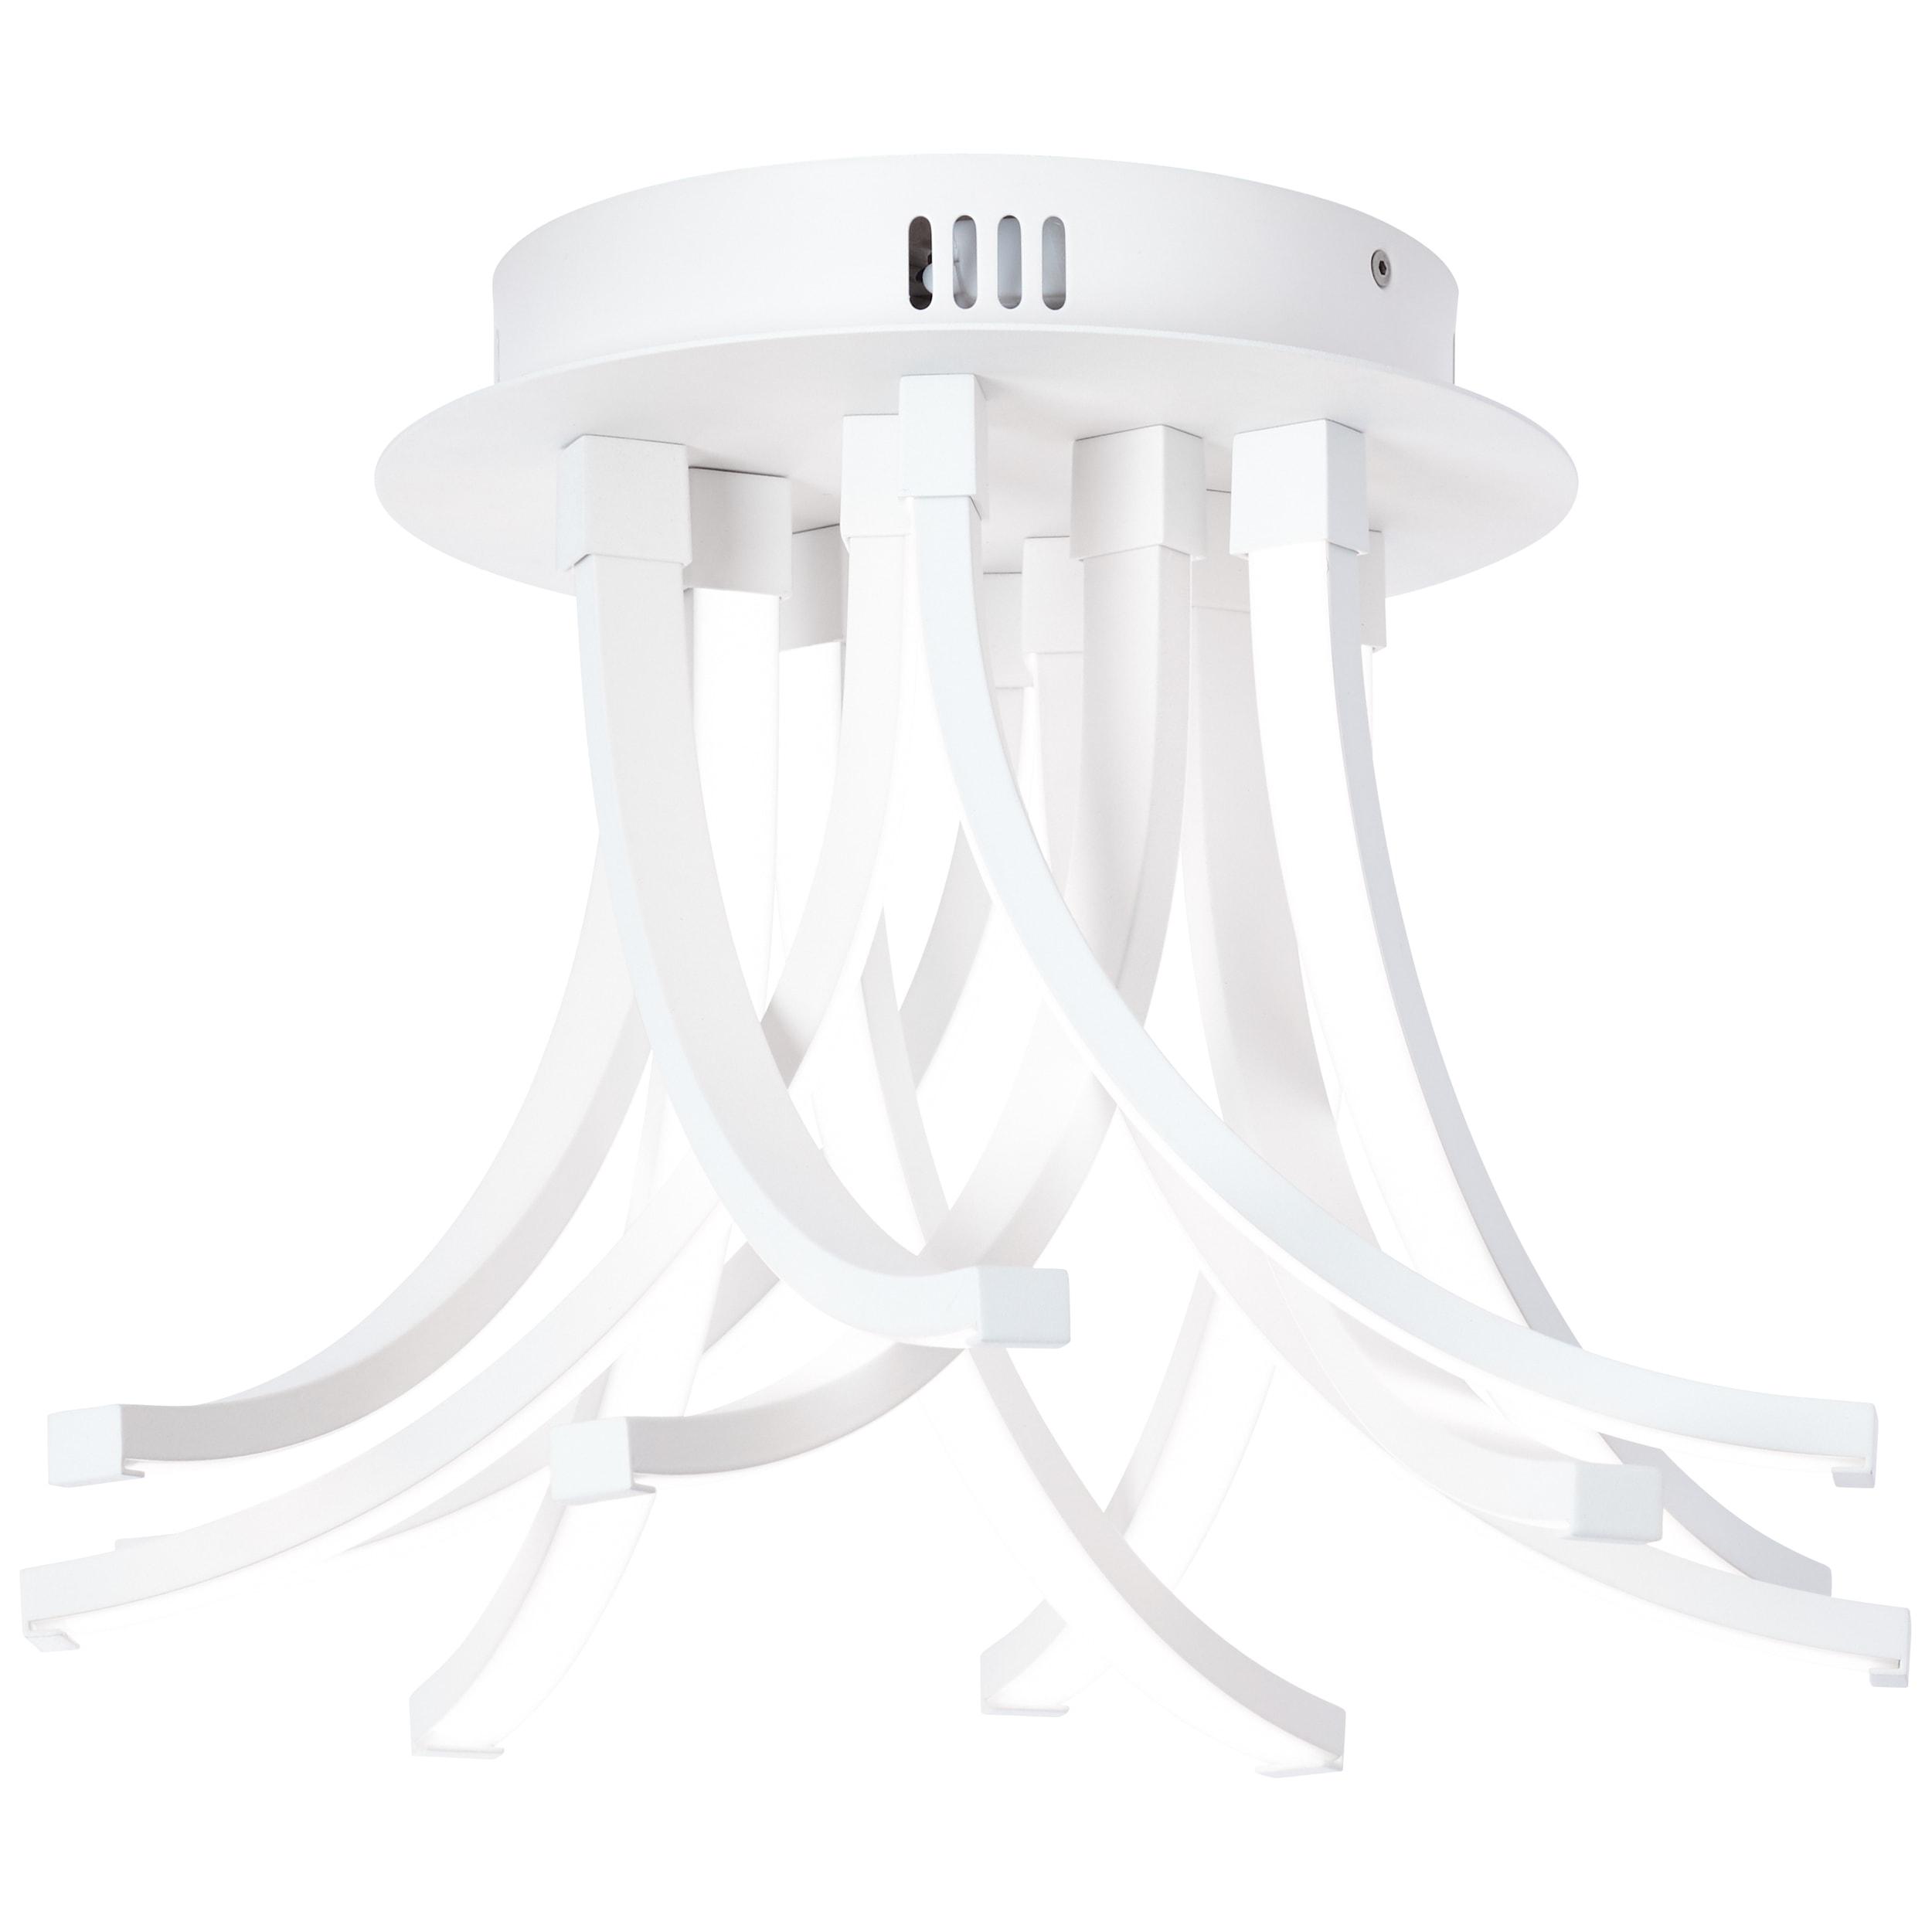 AEG Peria LED Deckenleuchte 40cm sand/weiß